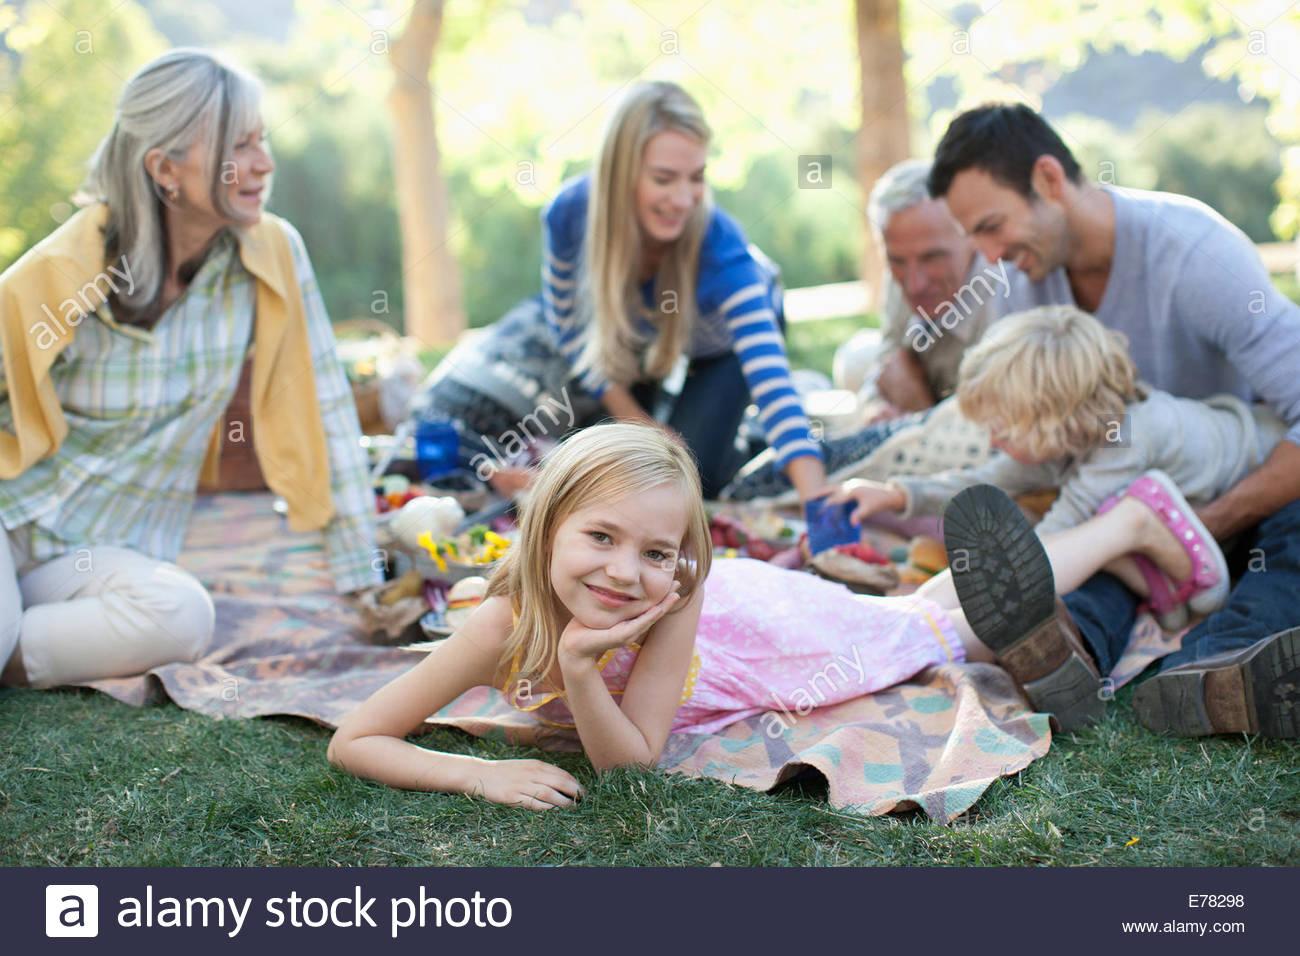 Girl relaxing on blanket outdoors - Stock Image